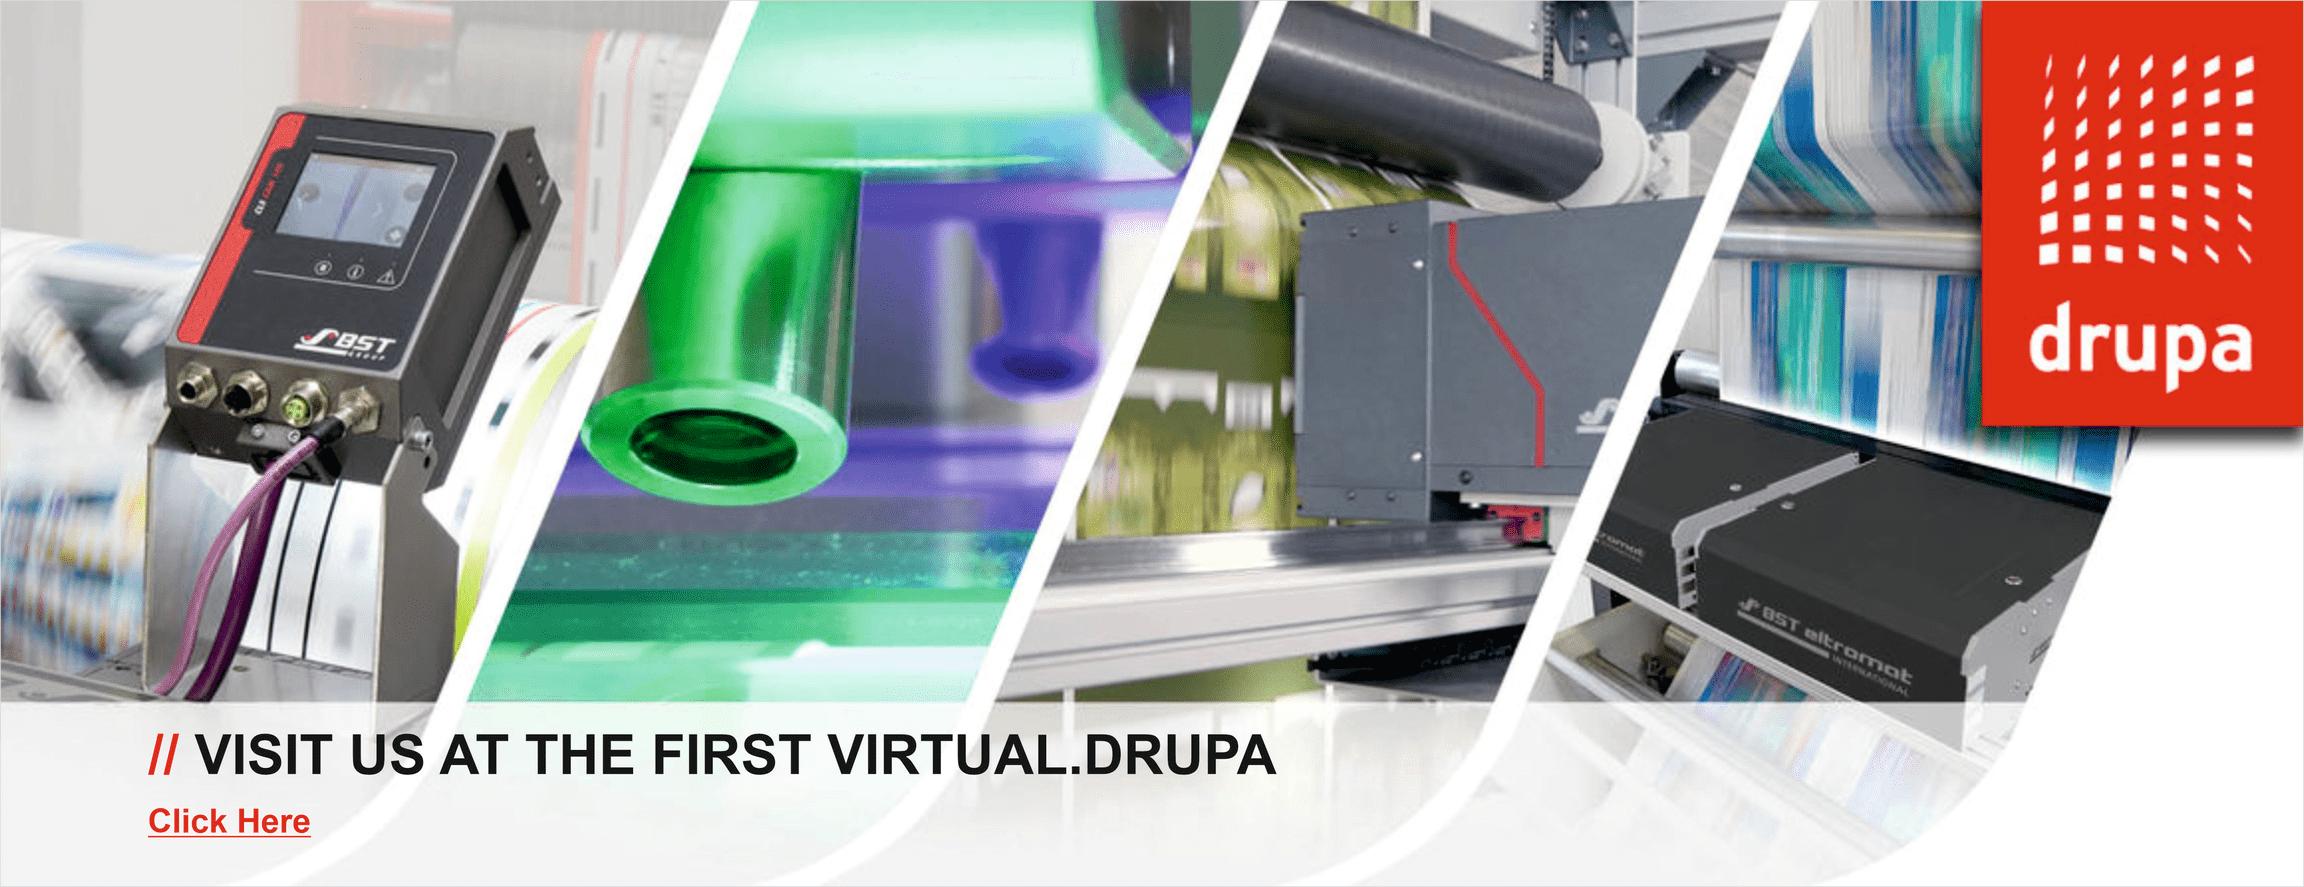 BST eltormat India Virtual Drupa 2021 Web Banner